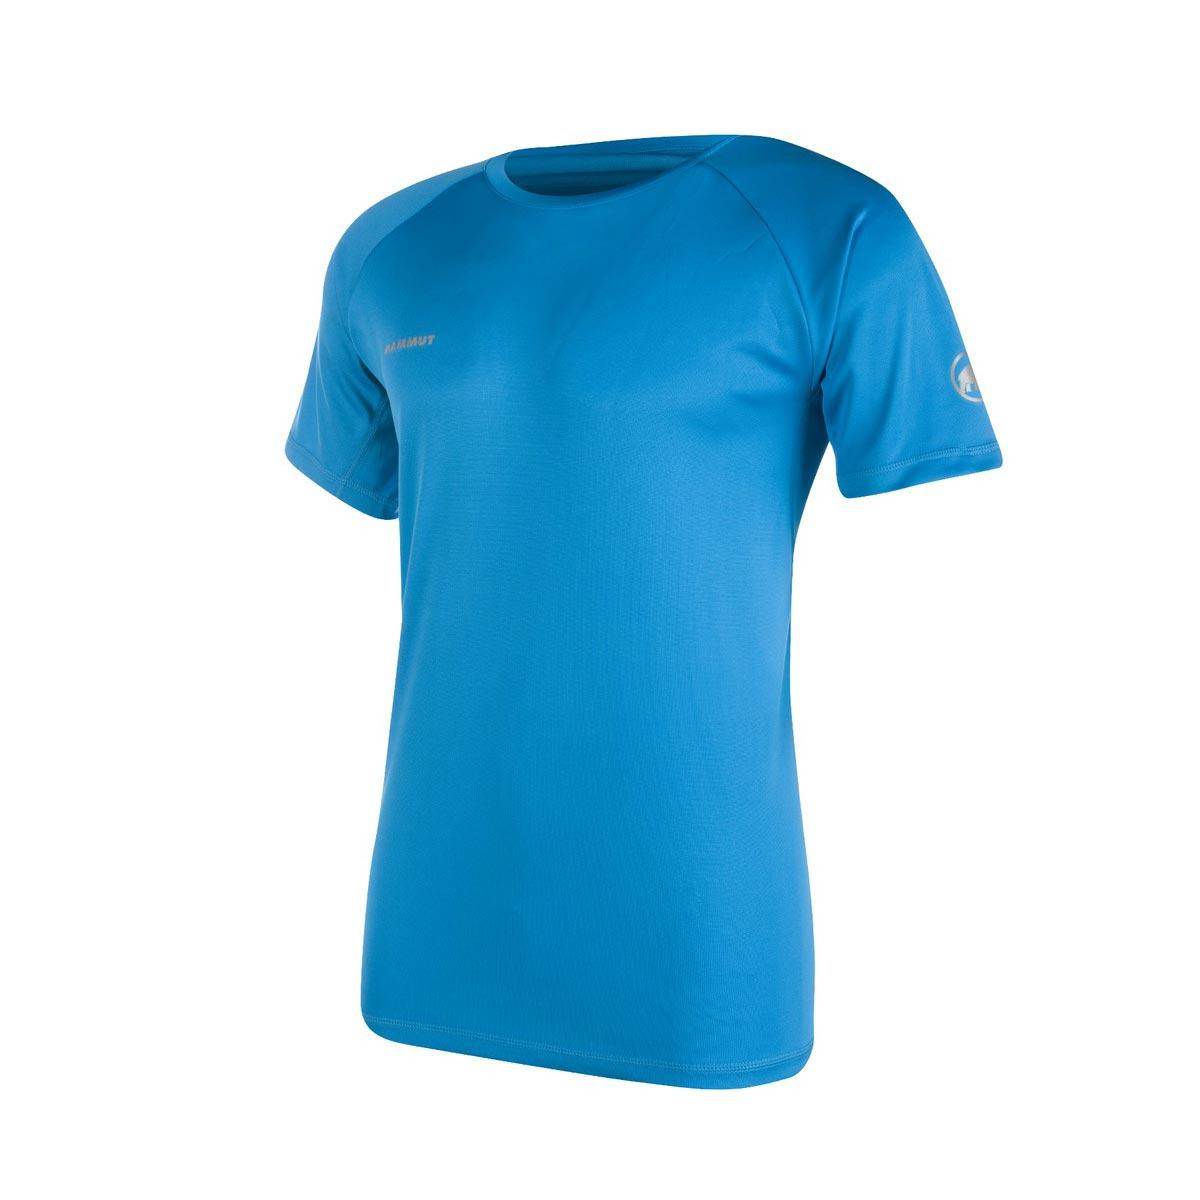 mammut mtr 71 advanced t shirt men 39 s base layer tops. Black Bedroom Furniture Sets. Home Design Ideas